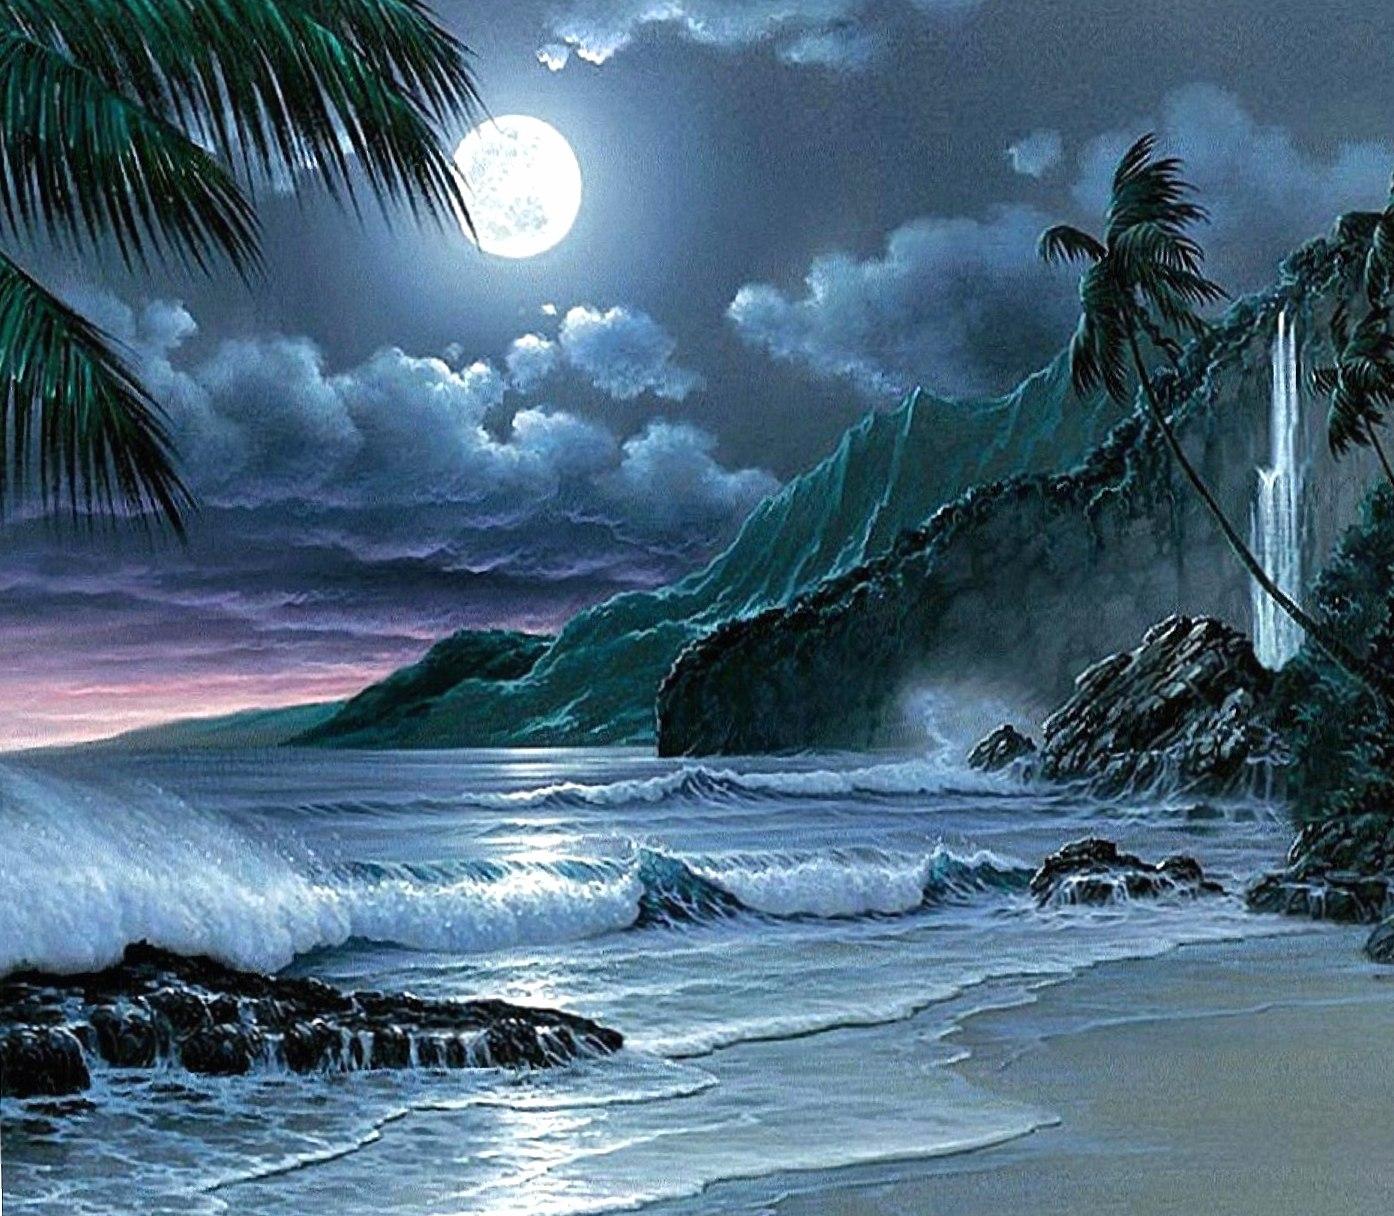 moon night hd wallpapers HD quality